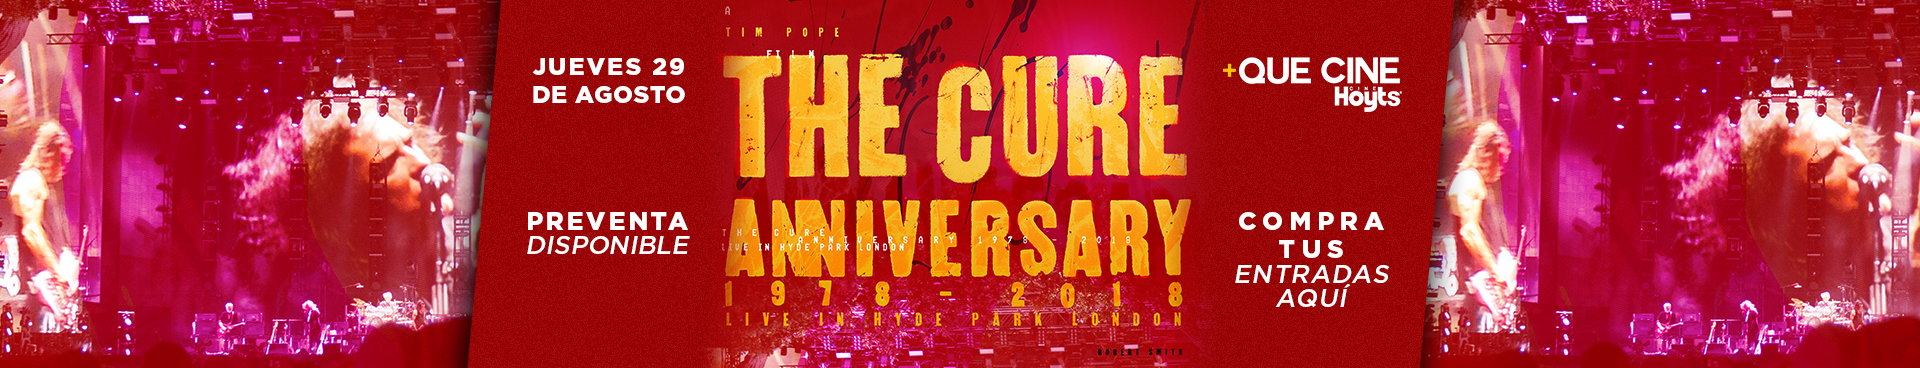 PREVENTA +QUE CINE: THE CURE ANNIVERSARY CURE 1978 - 2018, JUEVES 29 DE AGOSTO